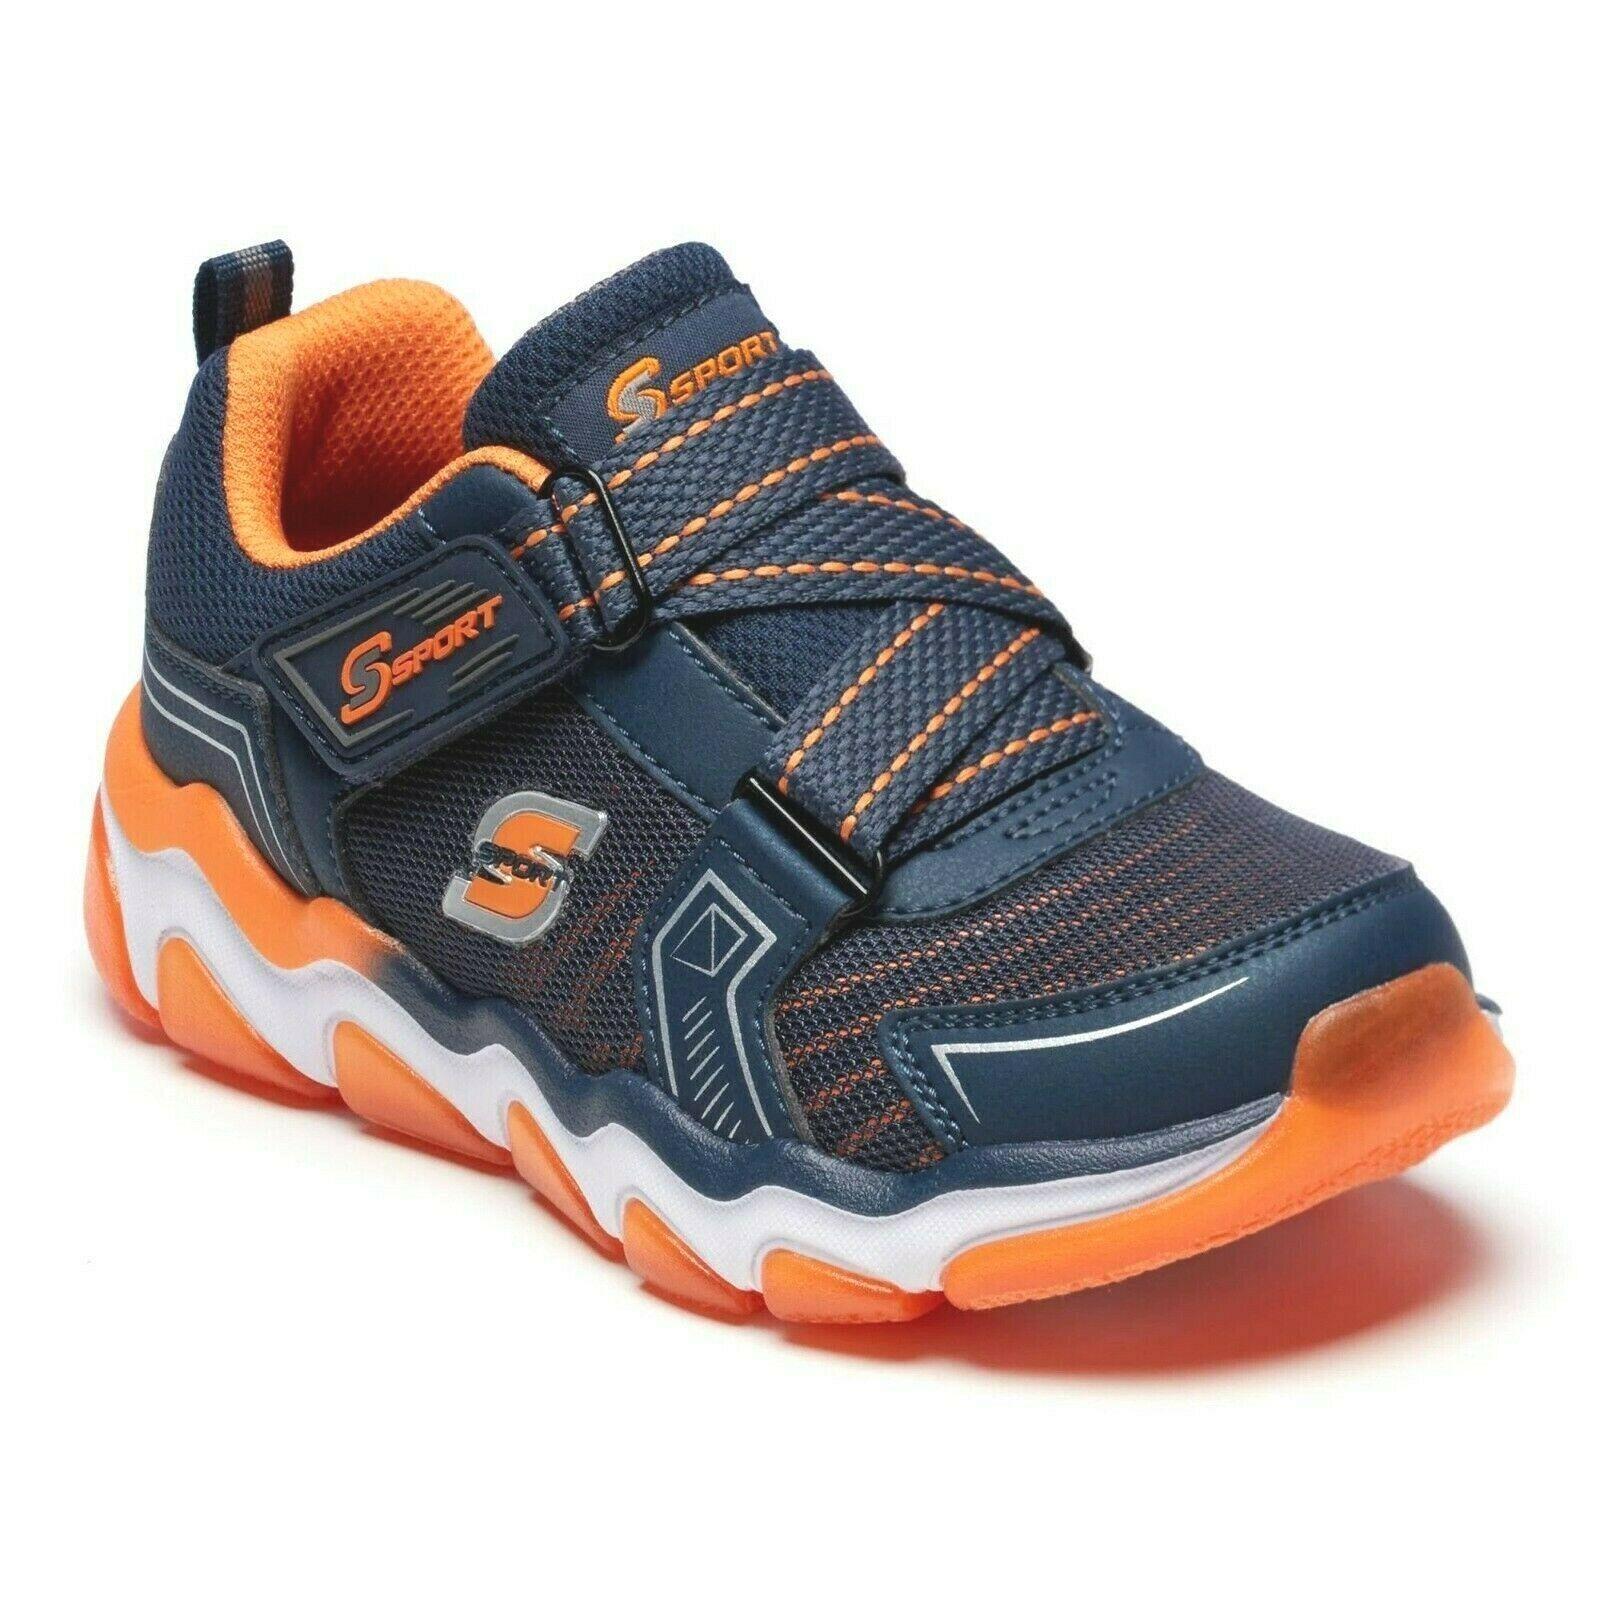 Garçons' S Sport Par Skechers Orion Performance Athlétique Chaussures Neuf